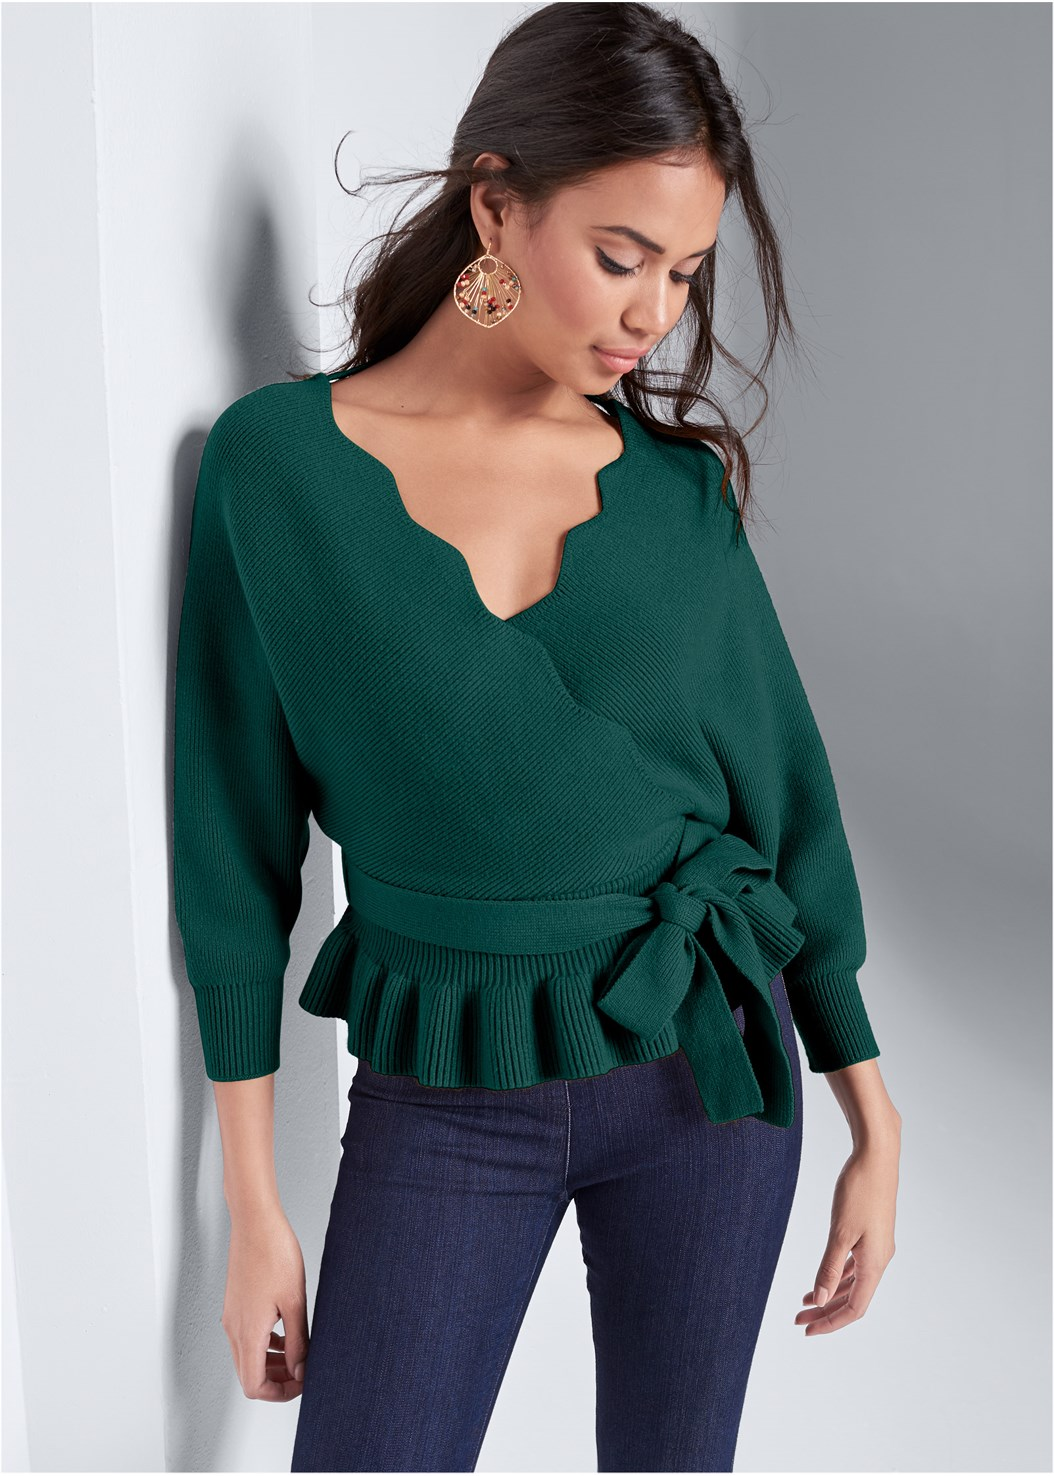 Peplum Tie Front Sweater,Mid Rise Slimming Stretch Jeggings,Peep Toe Booties,Beaded Leaf Shape Earrings